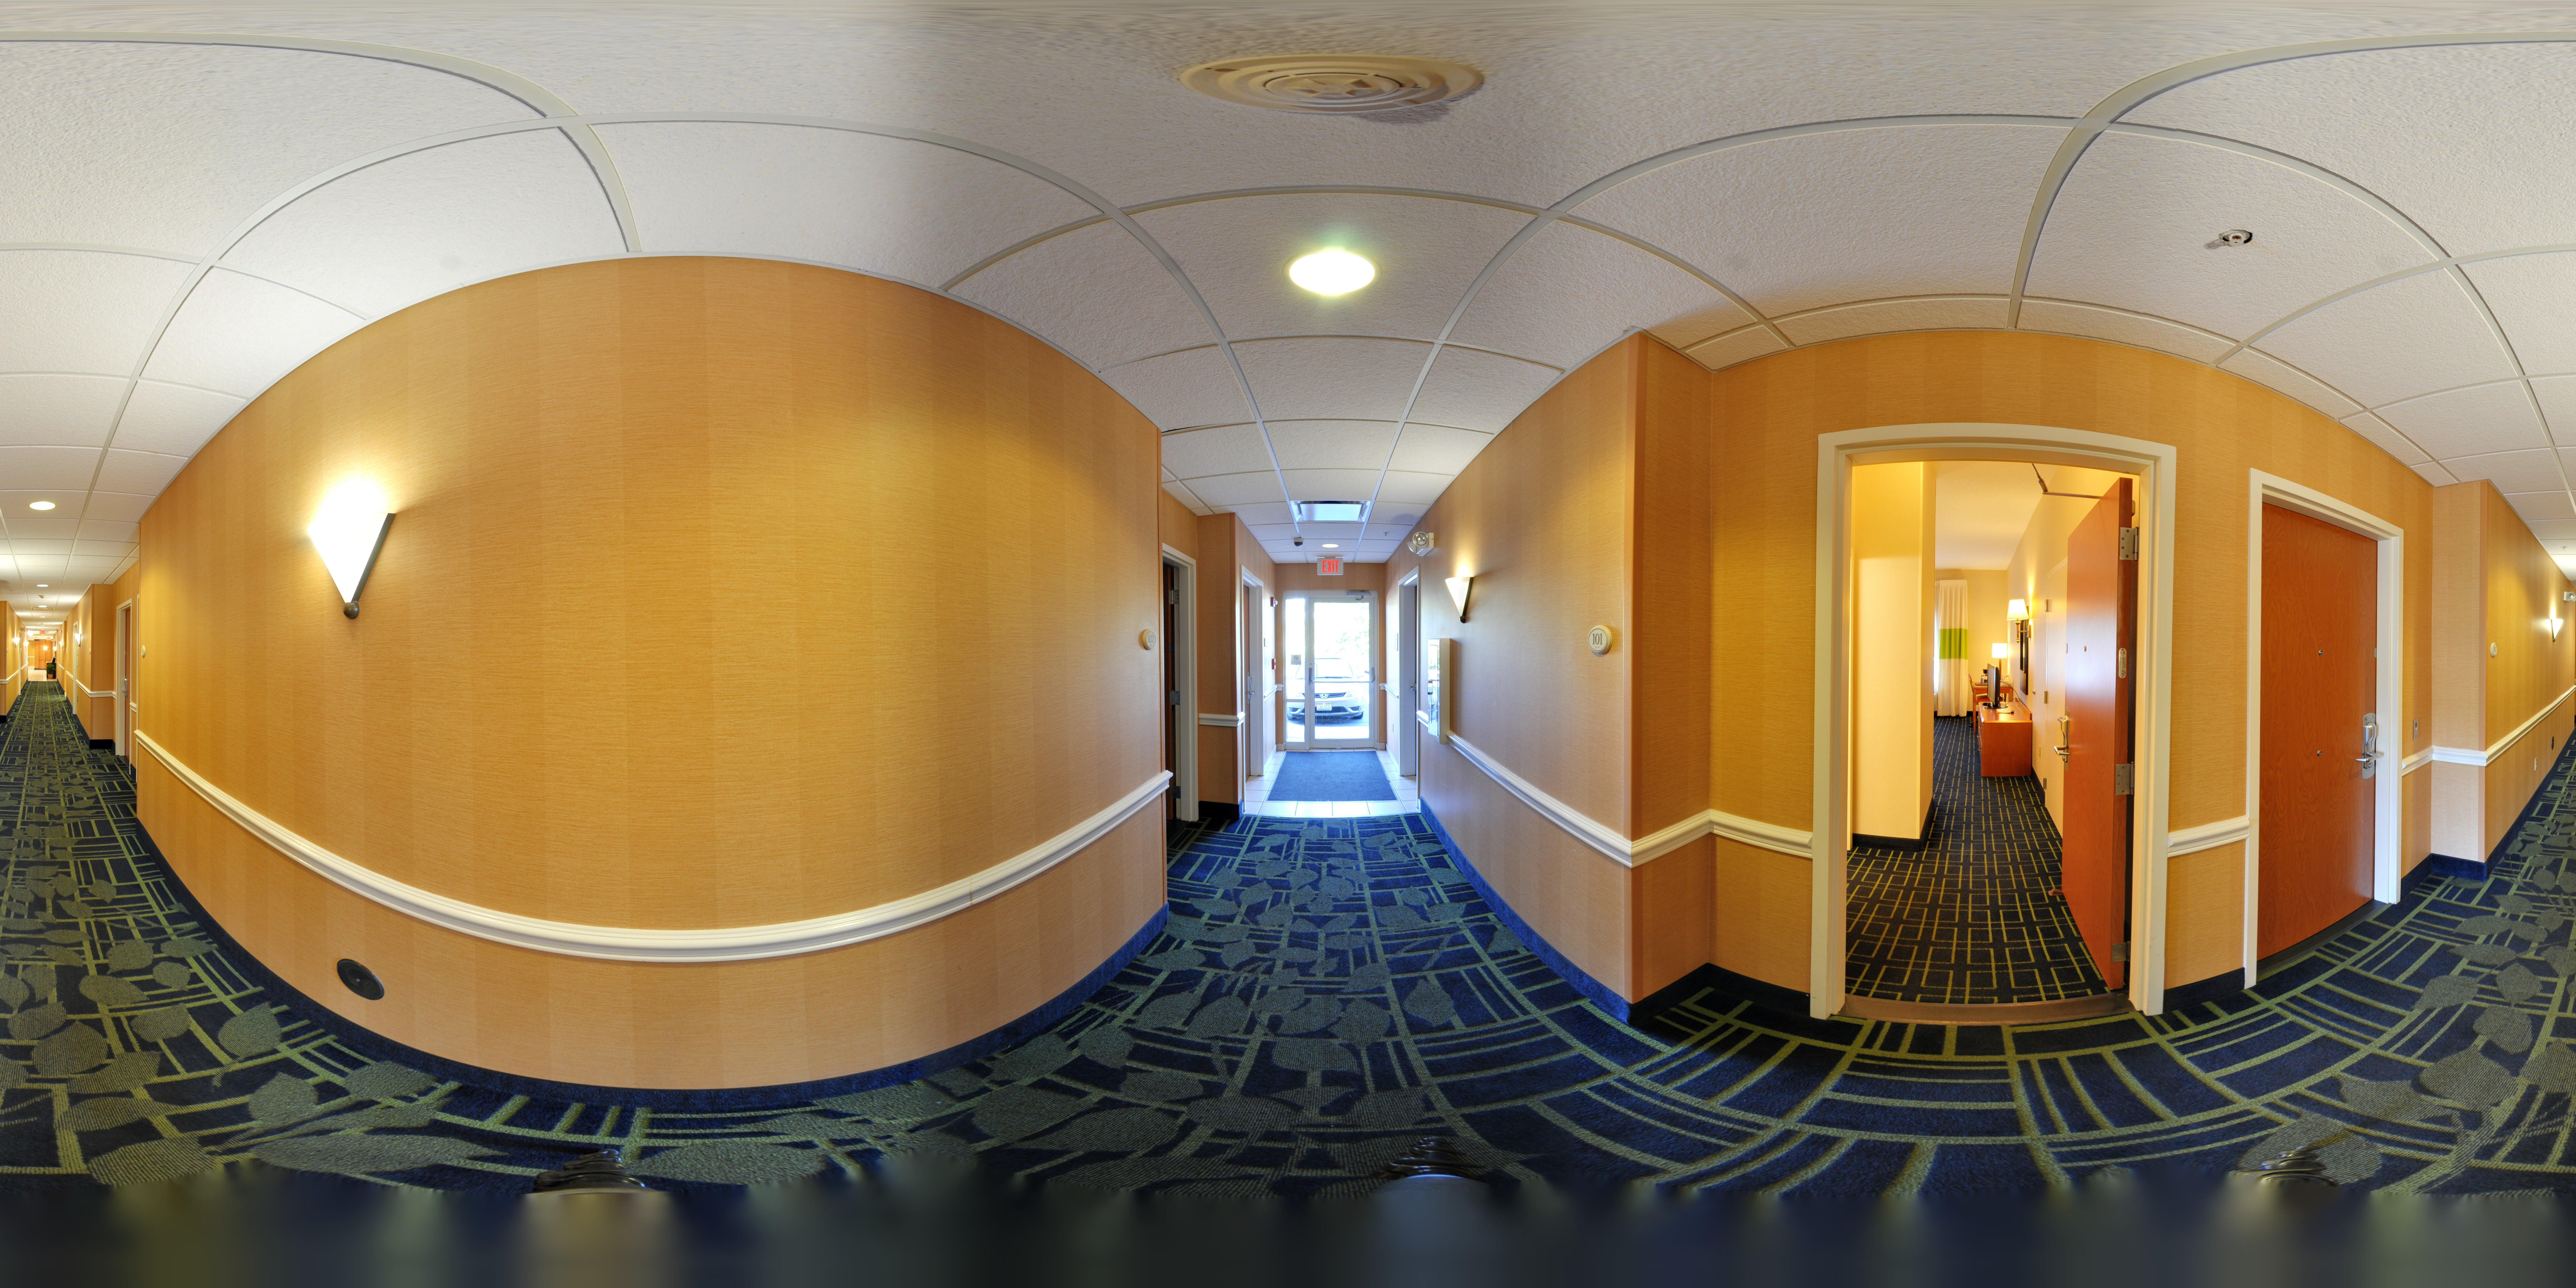 Fairfield Inn & Suites by Marriott Akron South image 41